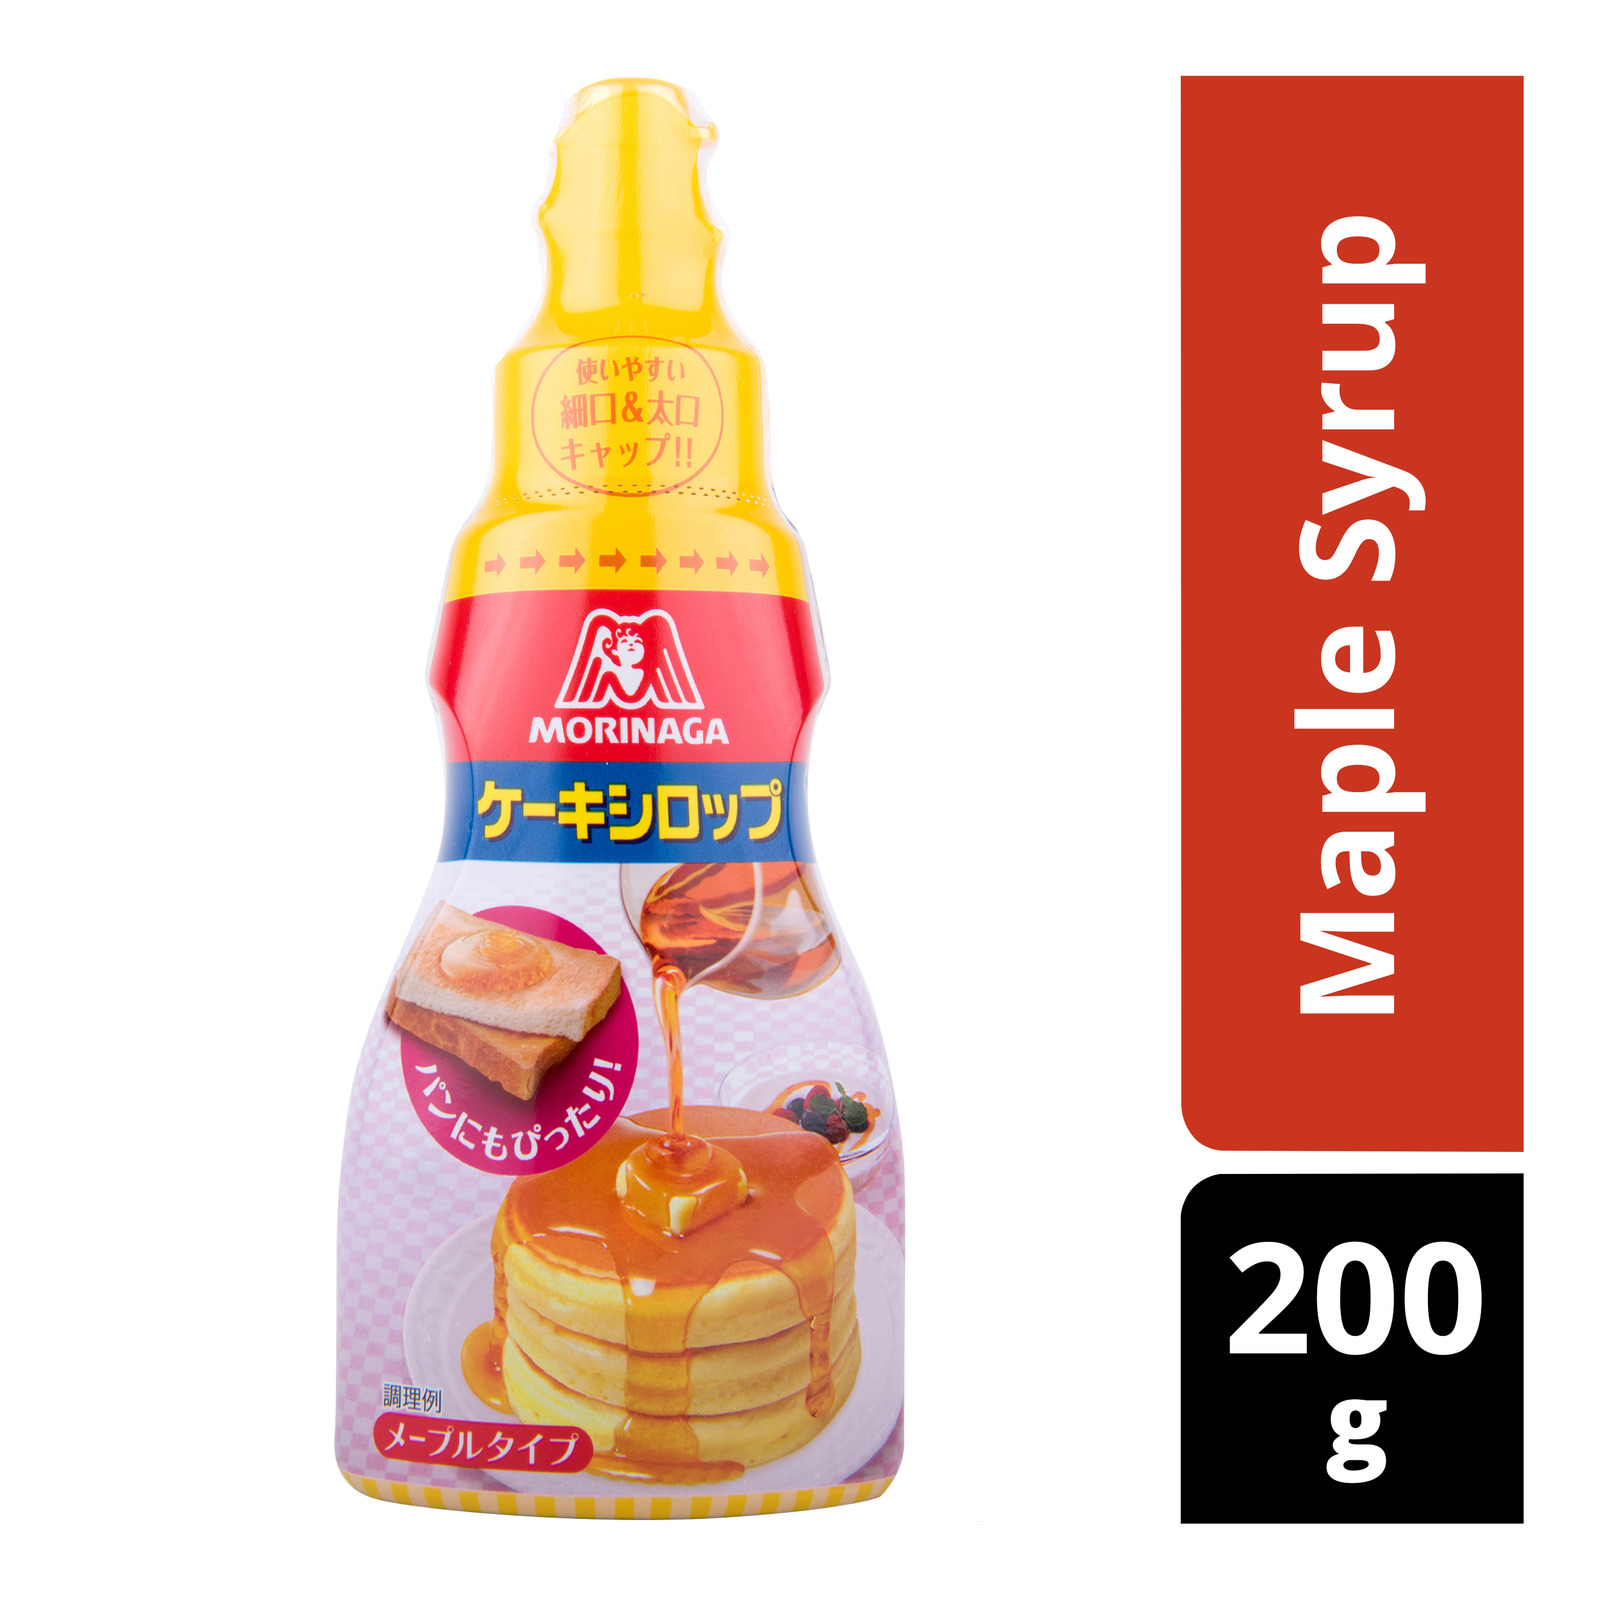 Morinaga Maple Syrup